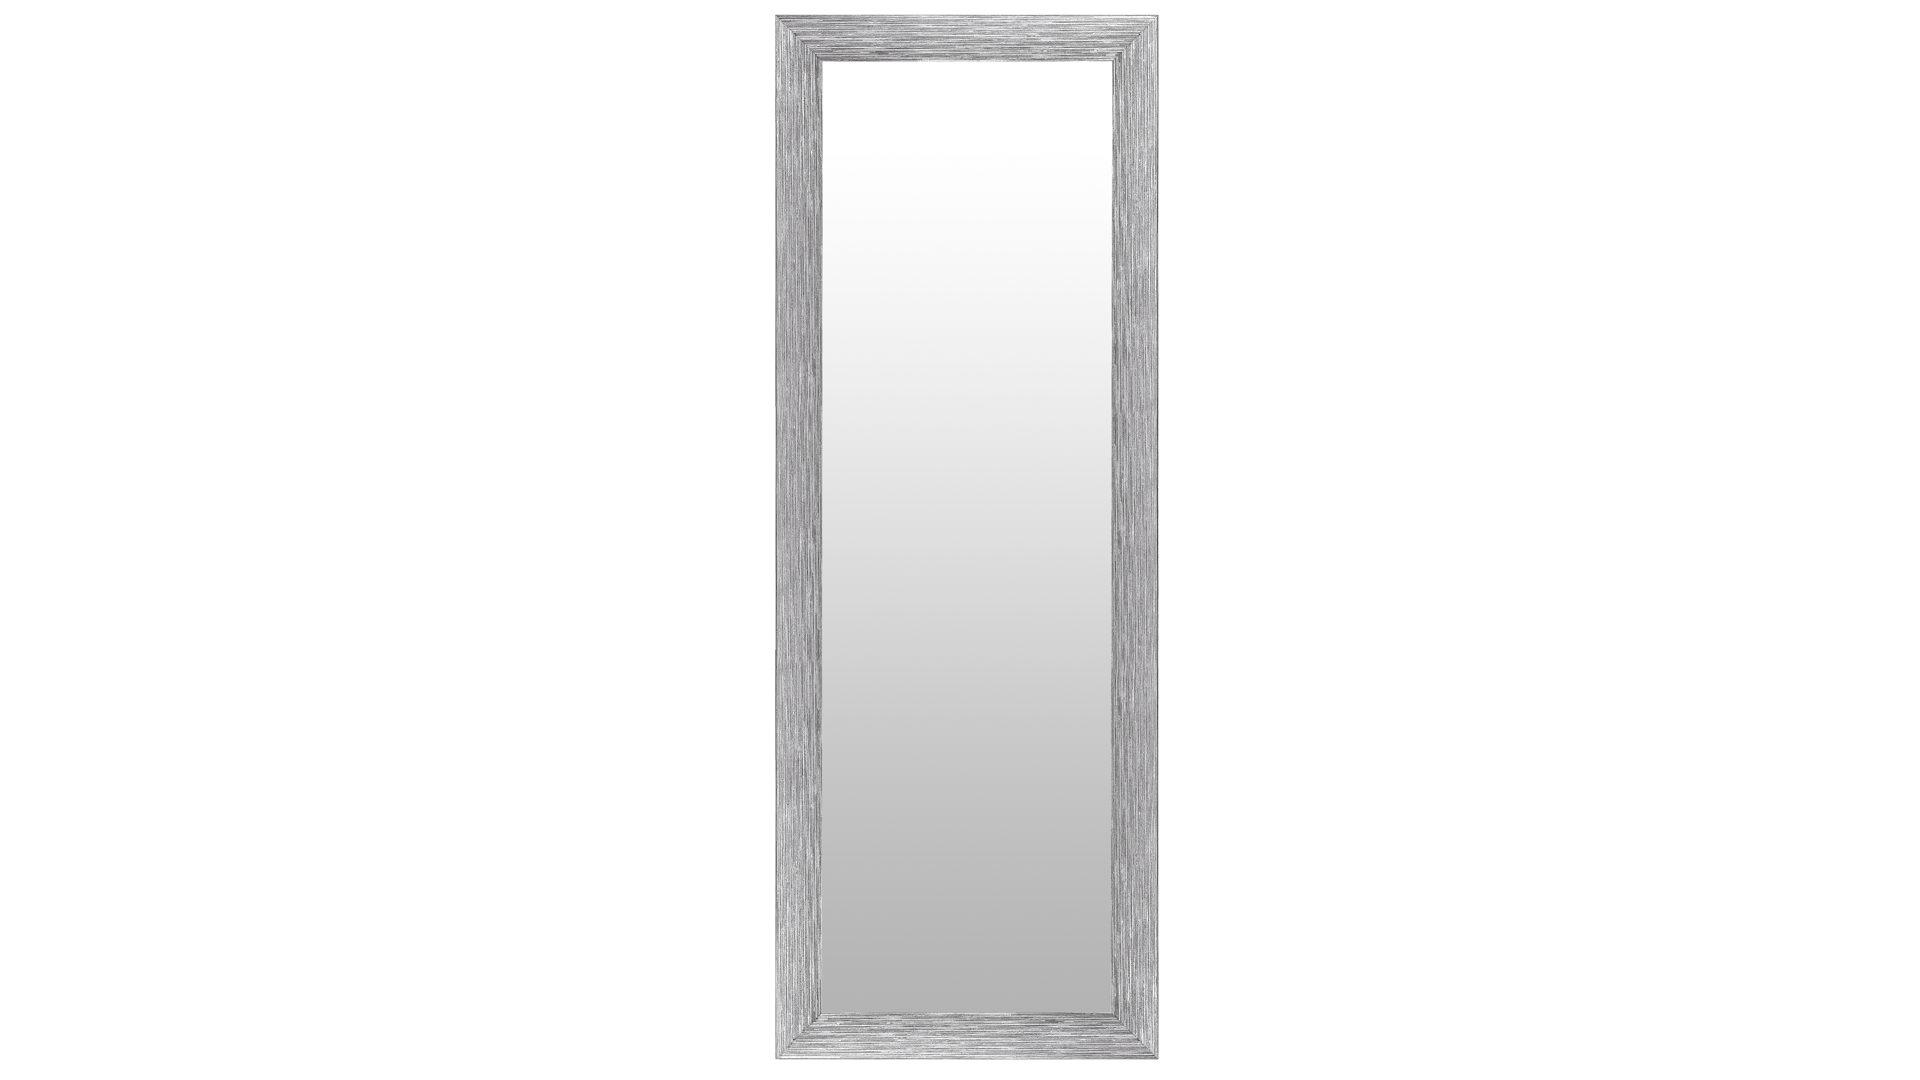 Len Für Hohe Räume möbel boer coesfeld räume flur diele spiegel wandspiegel